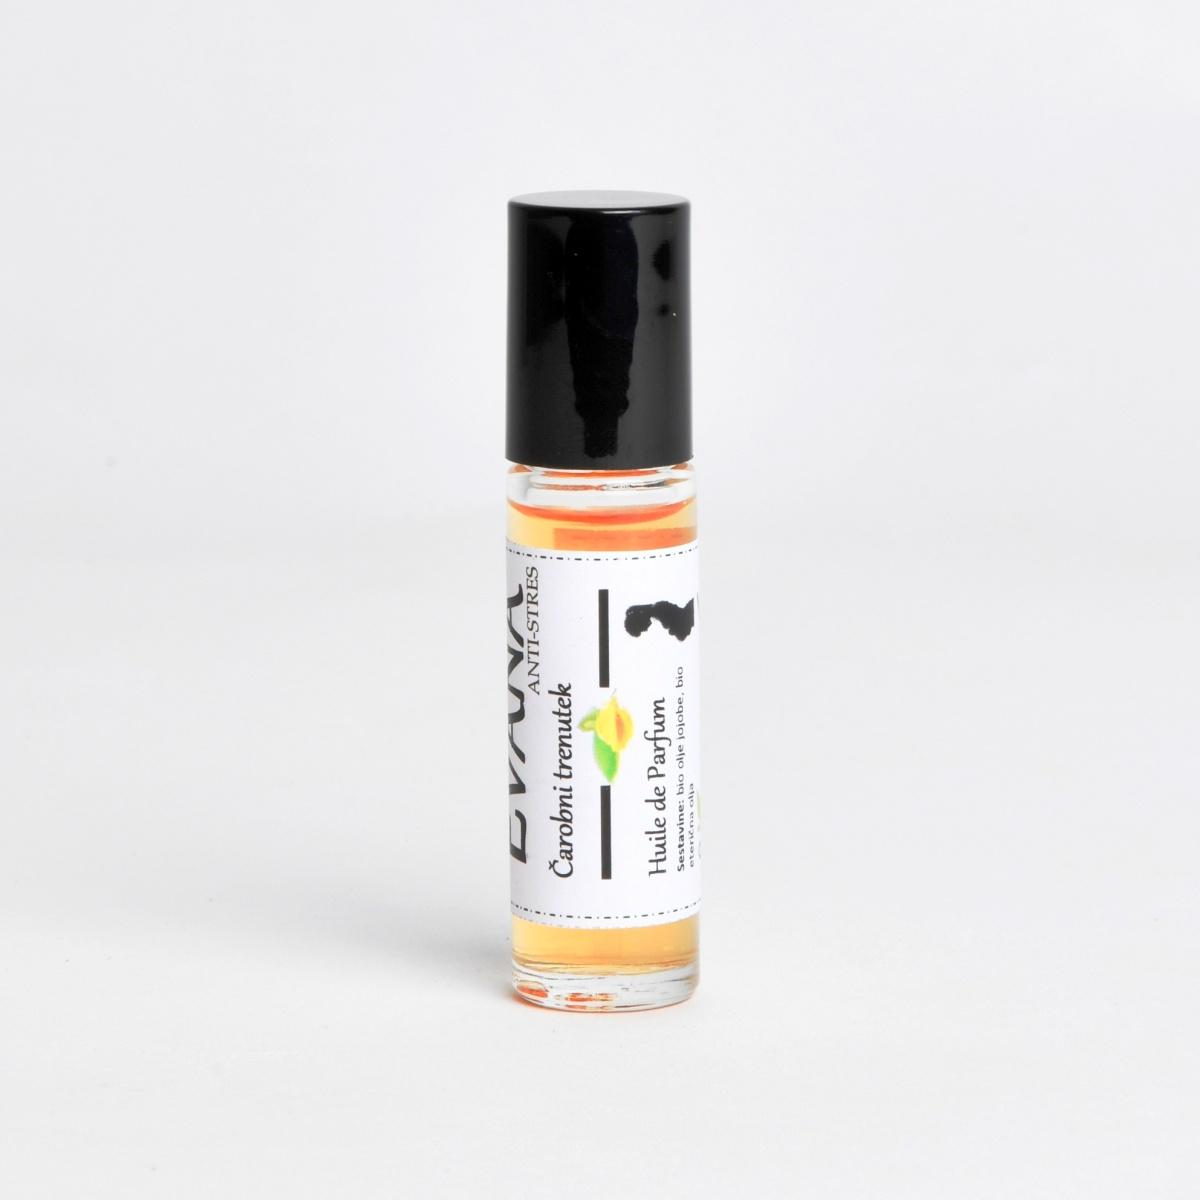 BIO huile de parfum 06 09 08 010